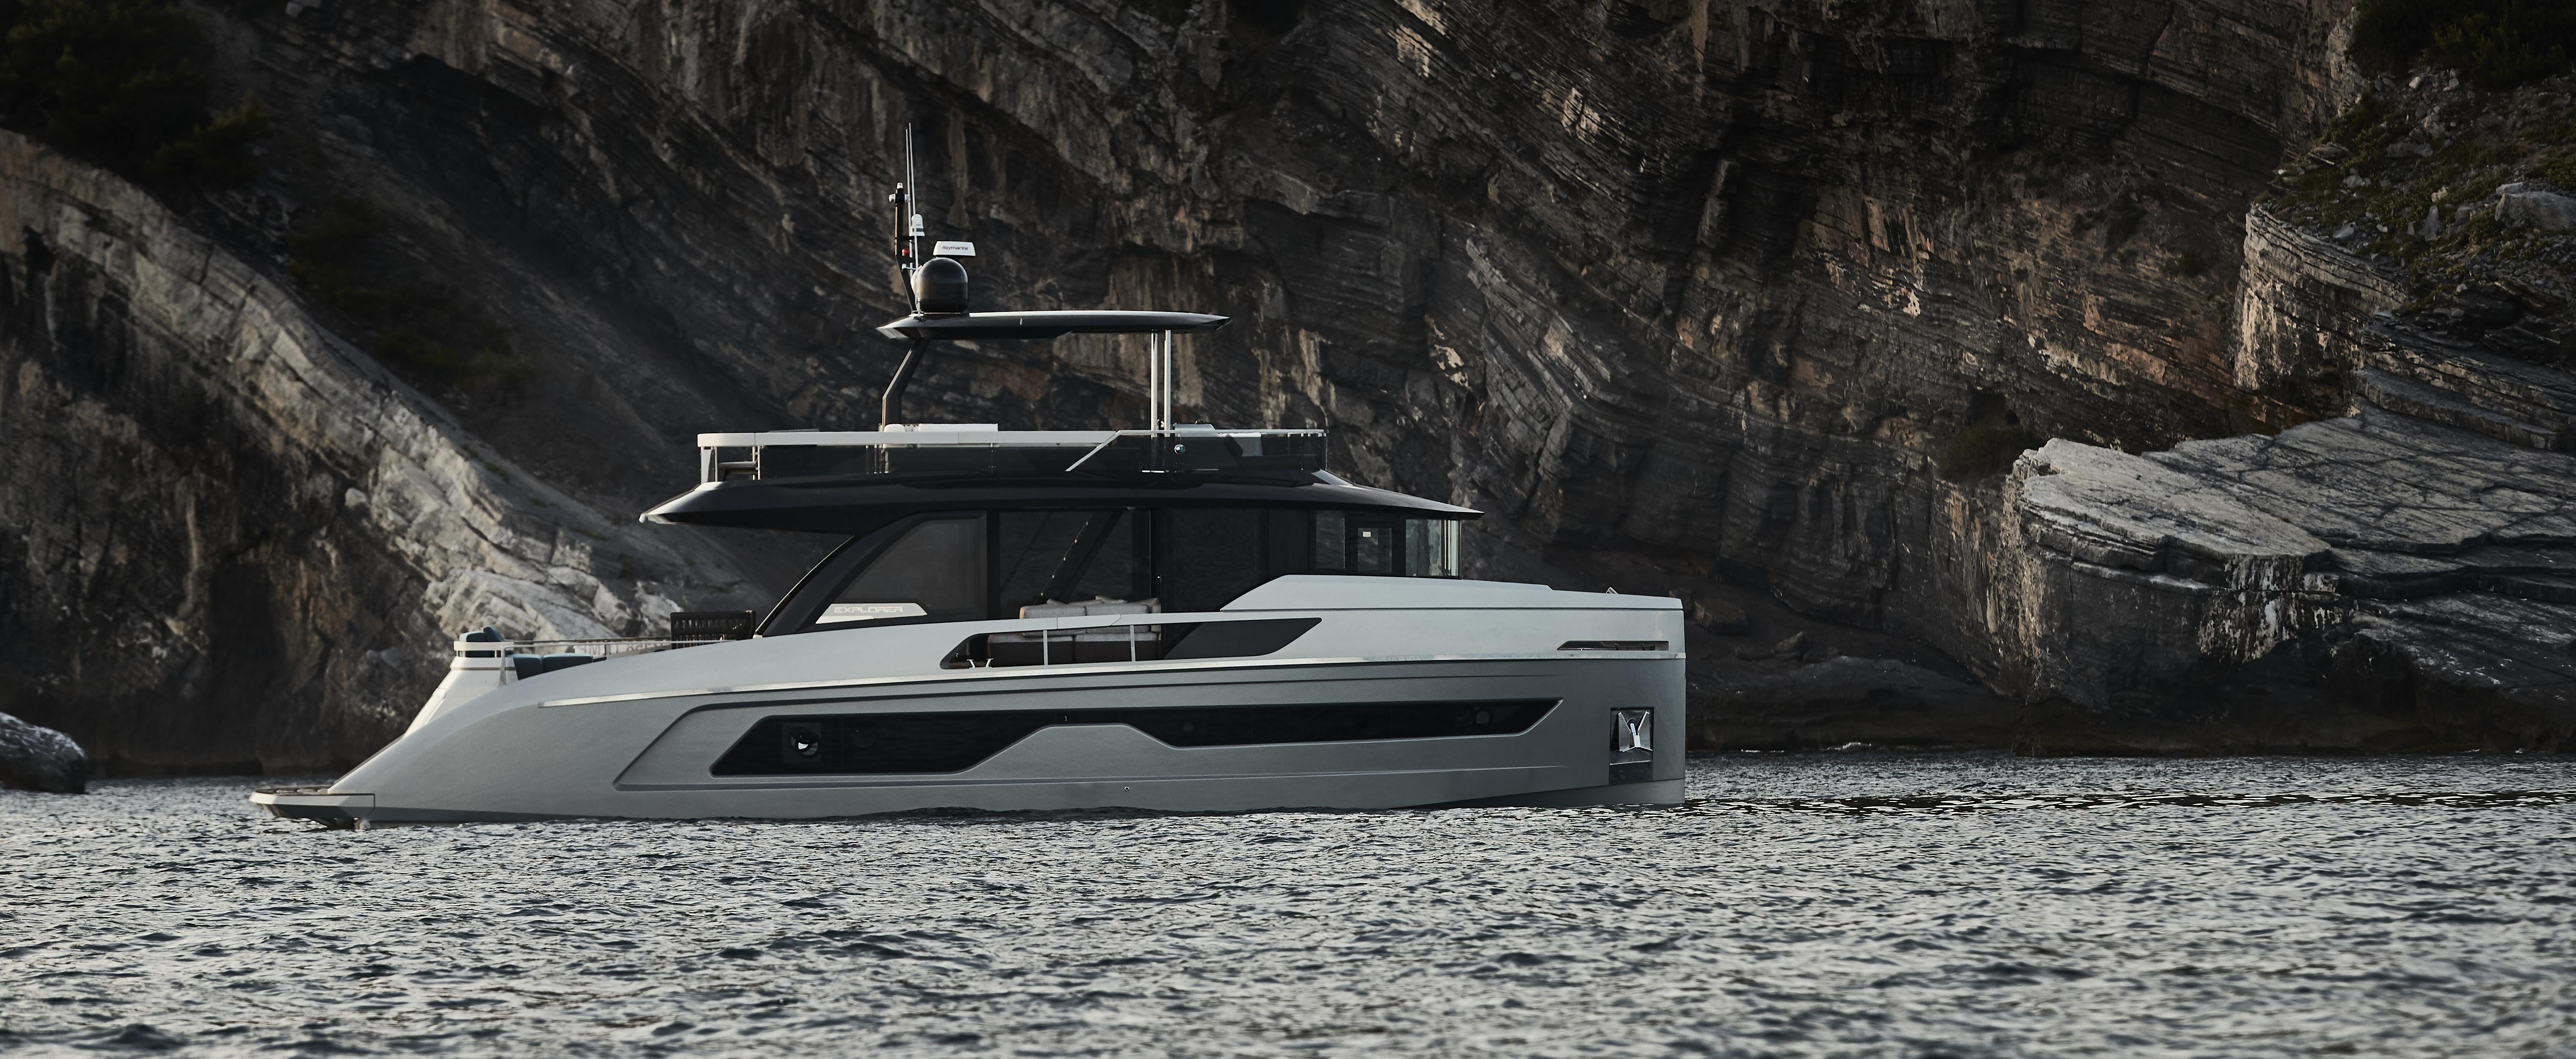 Explorer 62 yacht